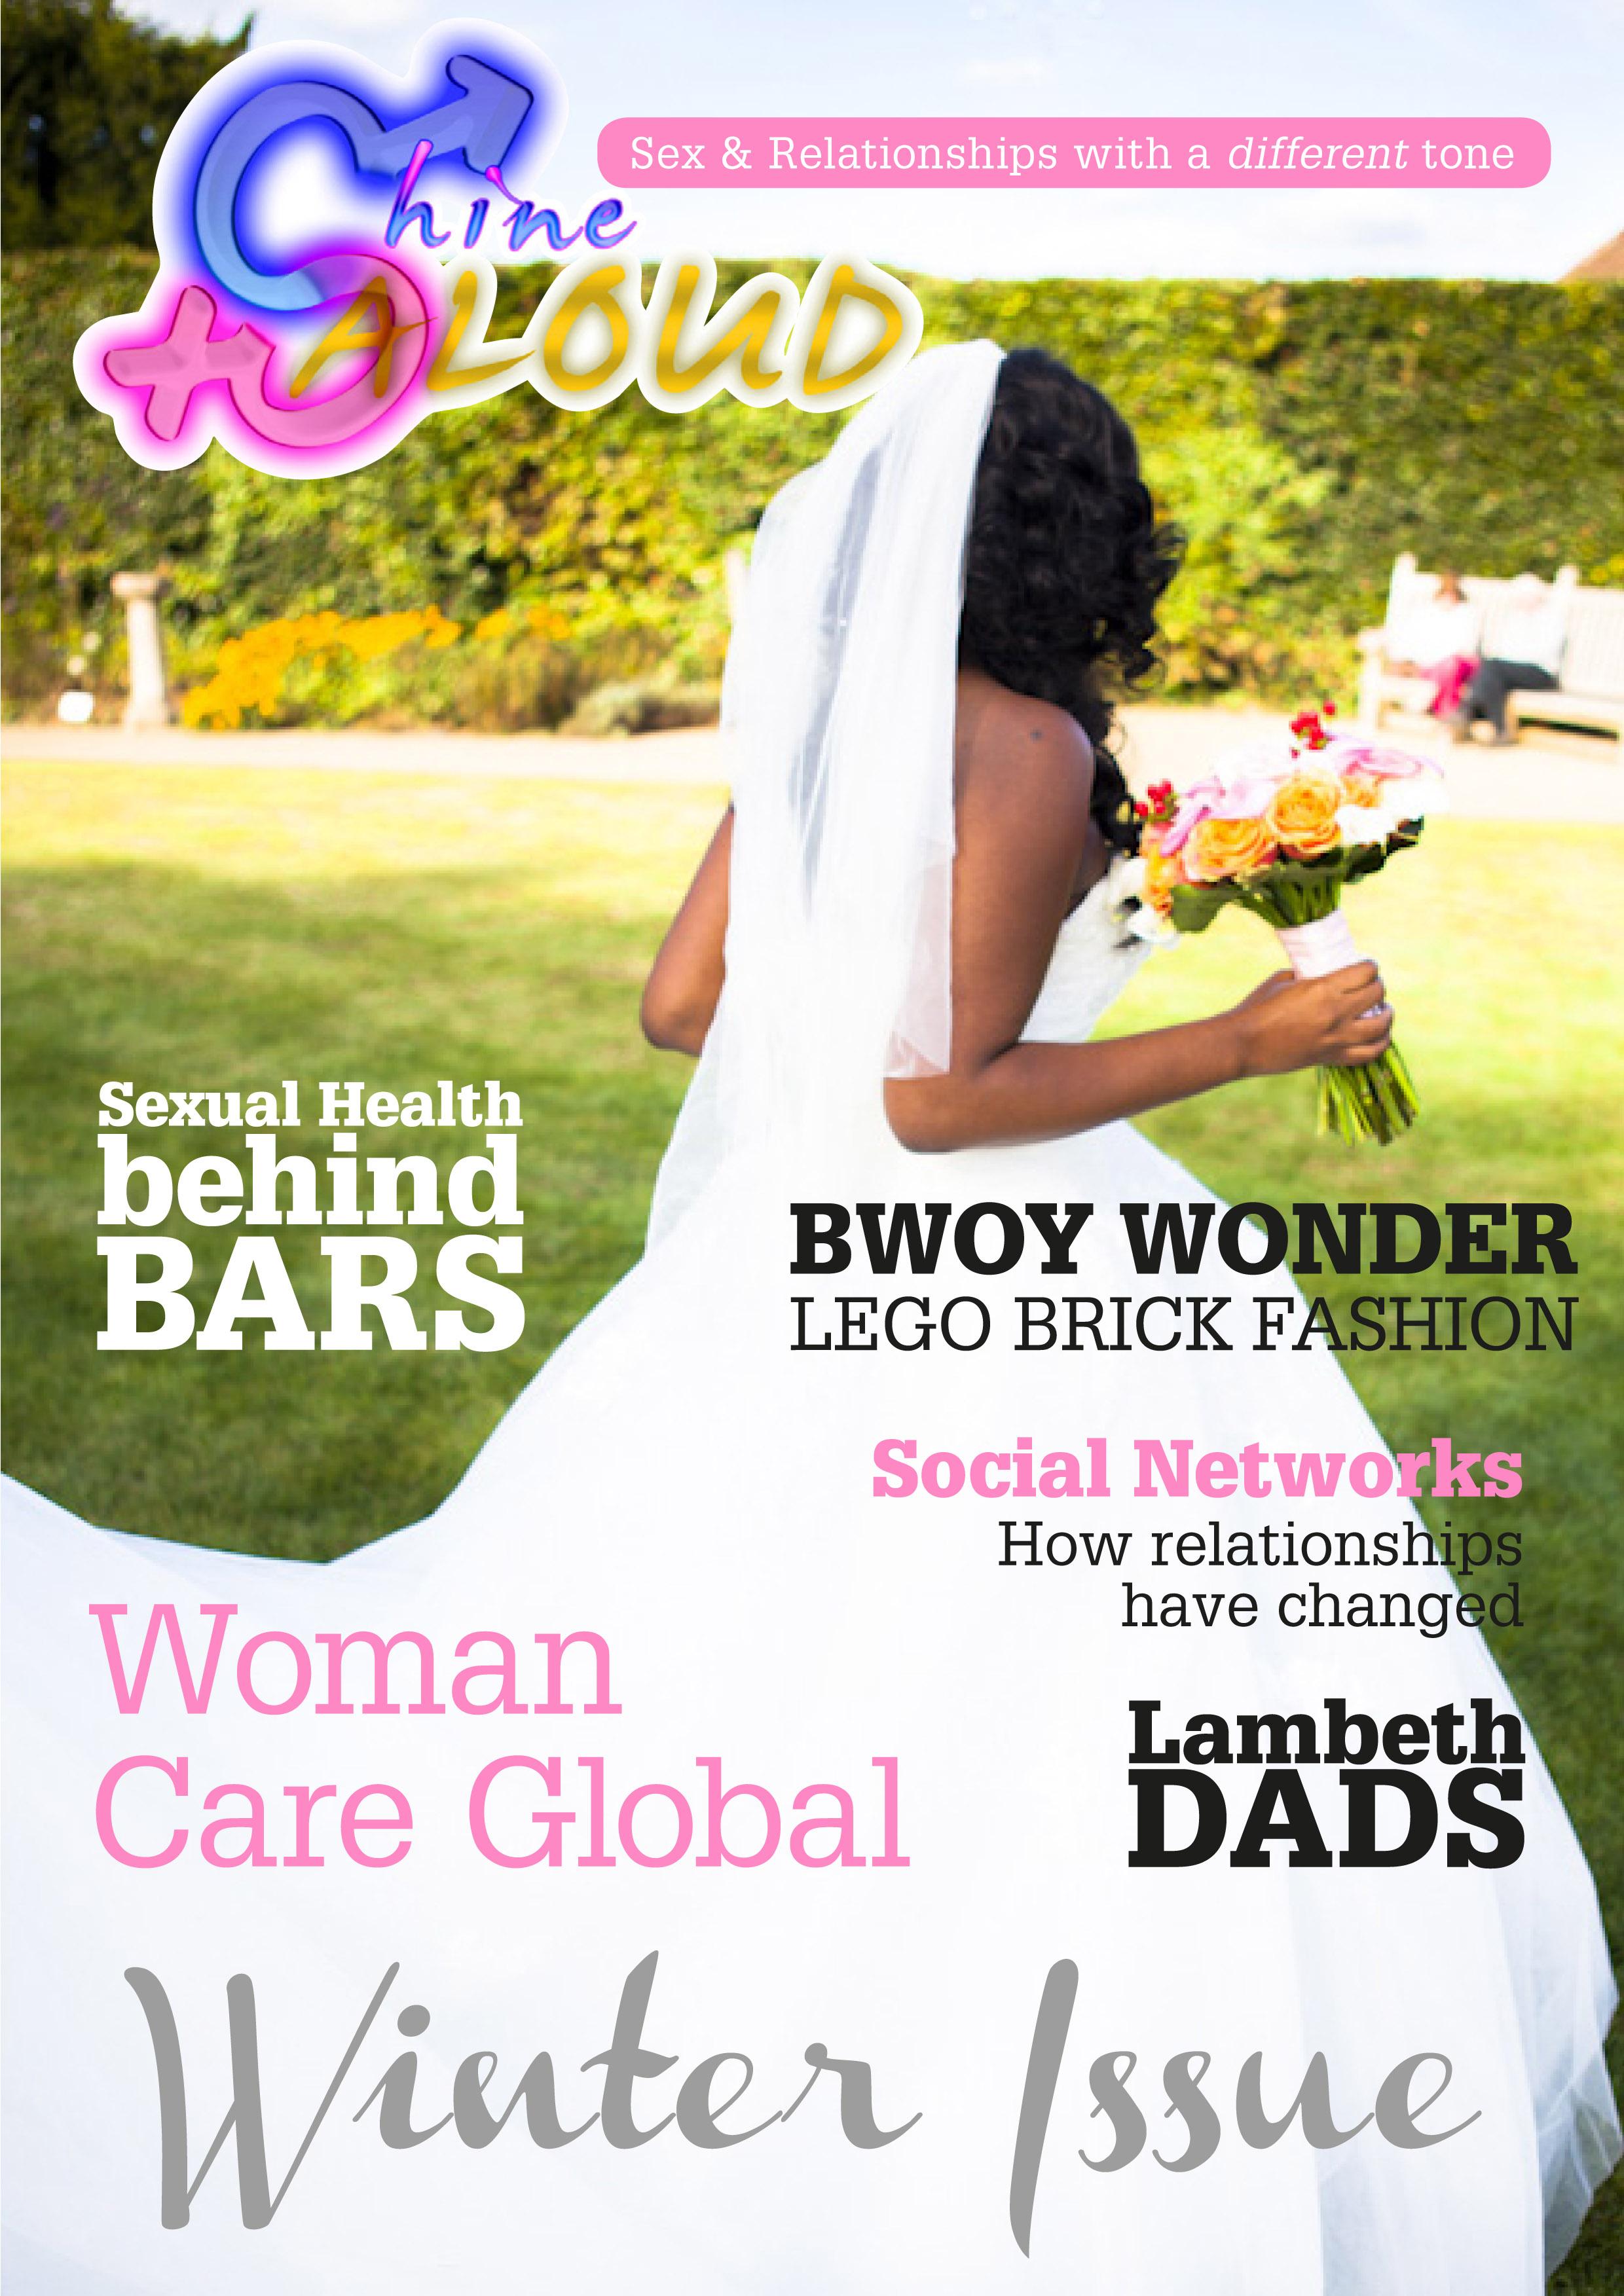 Issue 4 – OCTOBER 2012